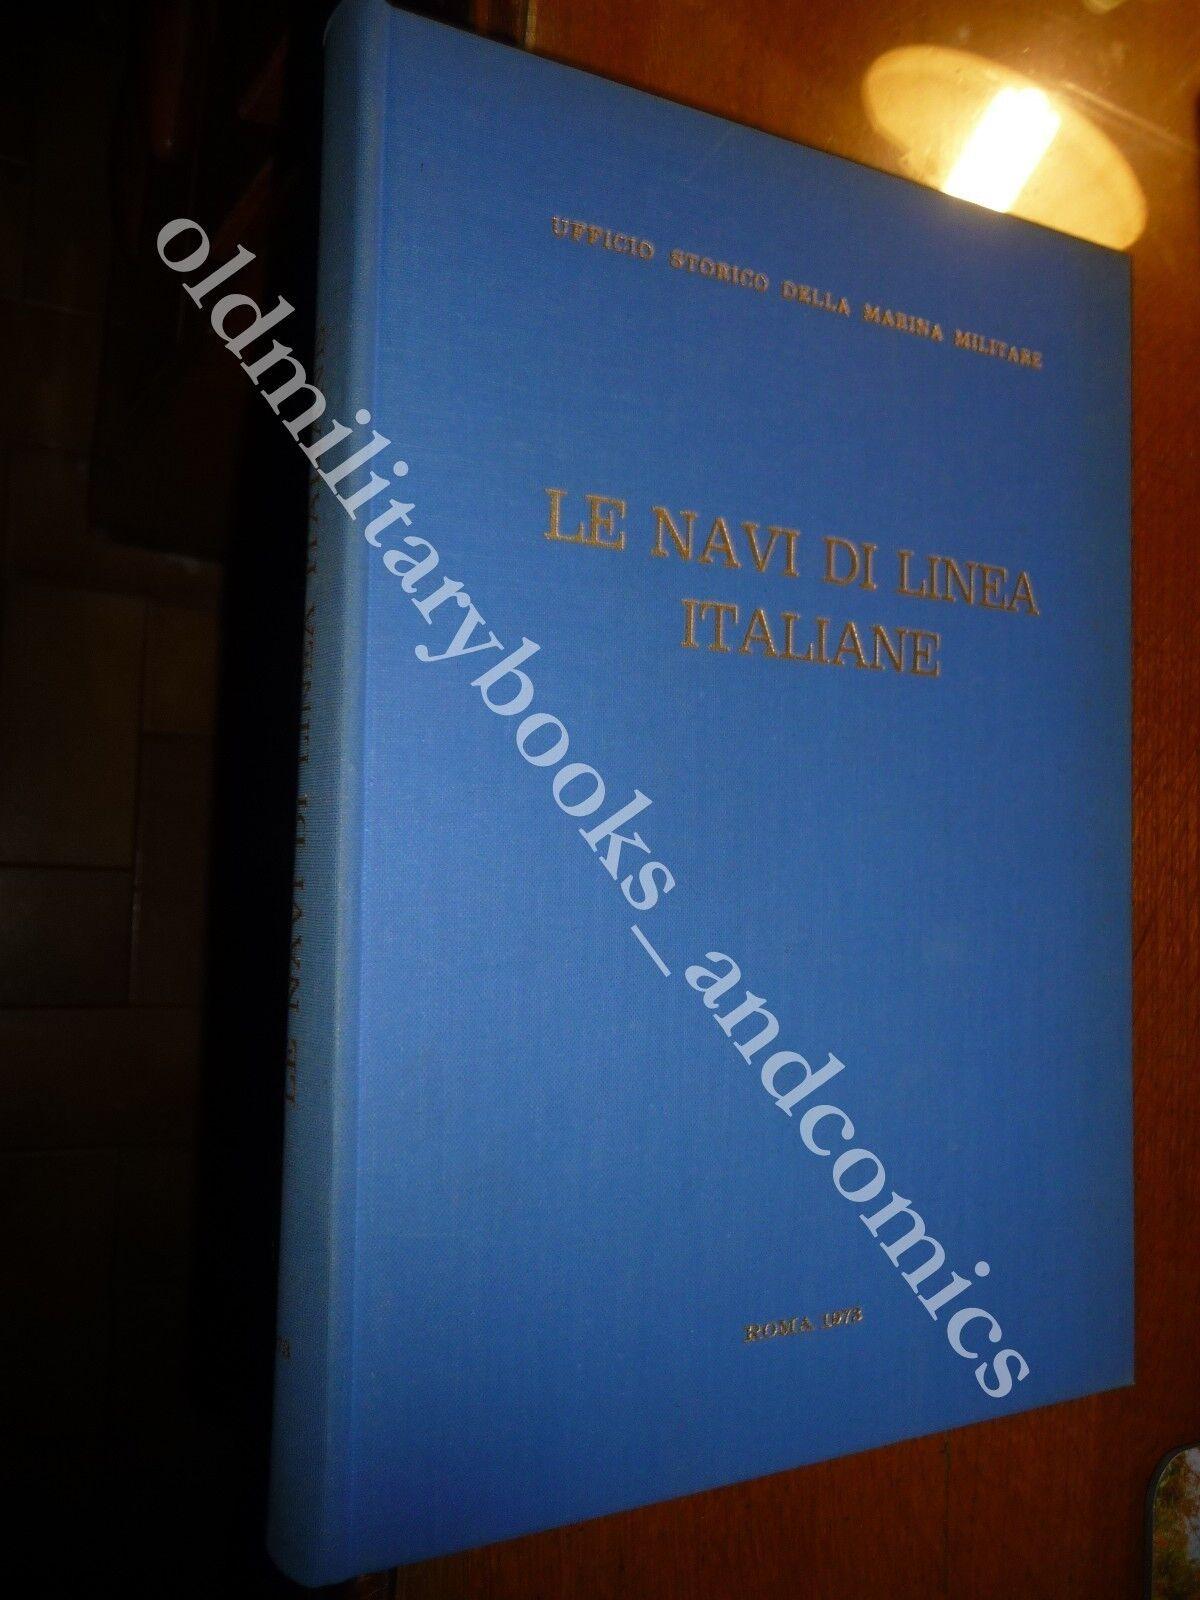 LE NAVI DI LINEA ITALIANE 1861-1969 GIORGERINI-NANI 1973 MARINA MILITARE